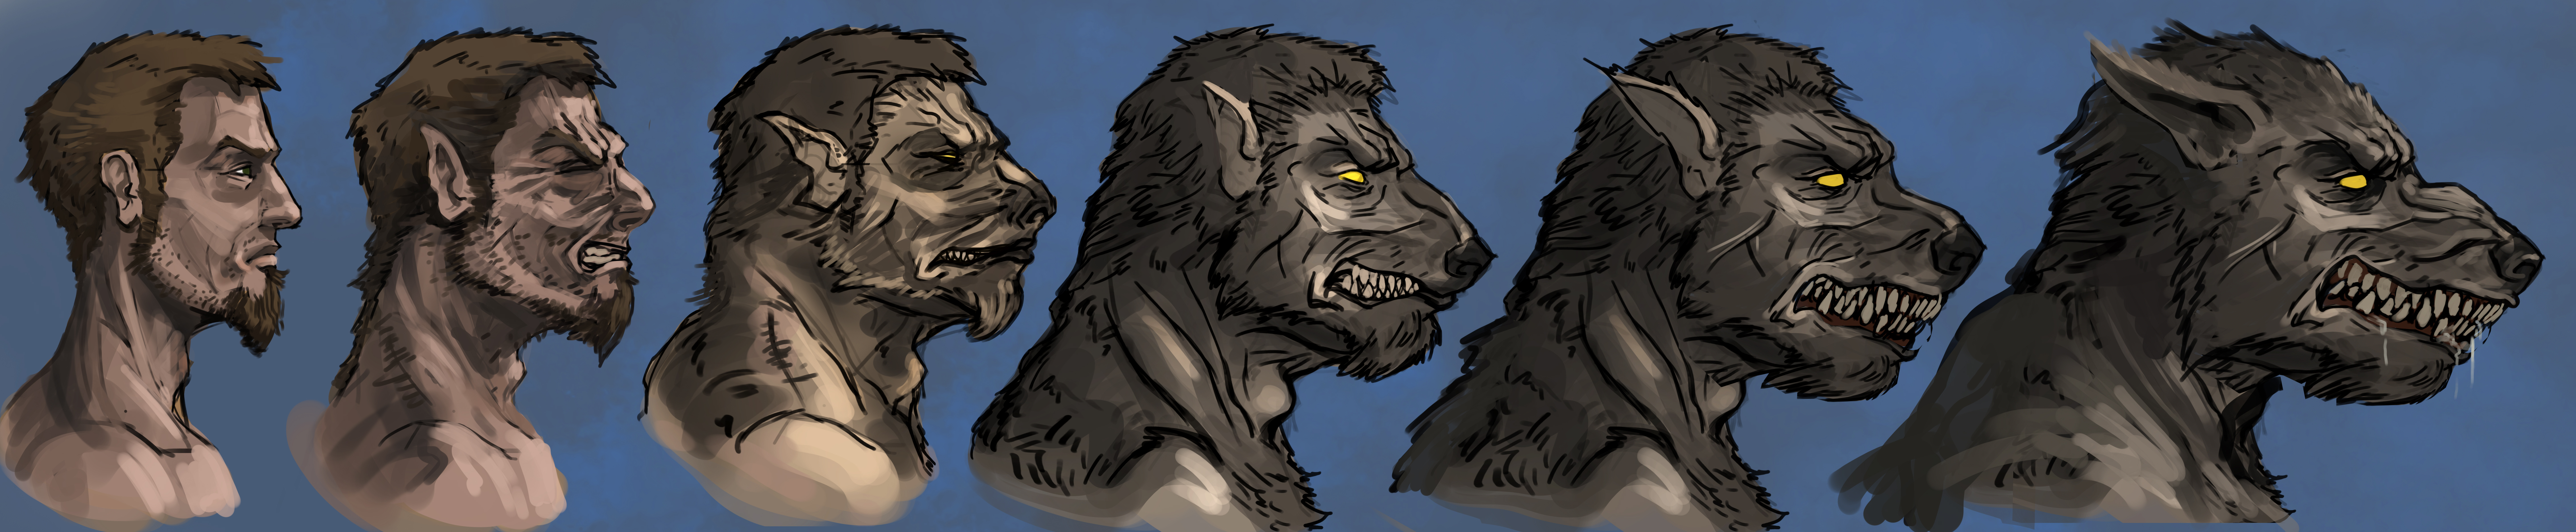 Drawn wolfman human love Explore 424 transformation Andy DeviantArt